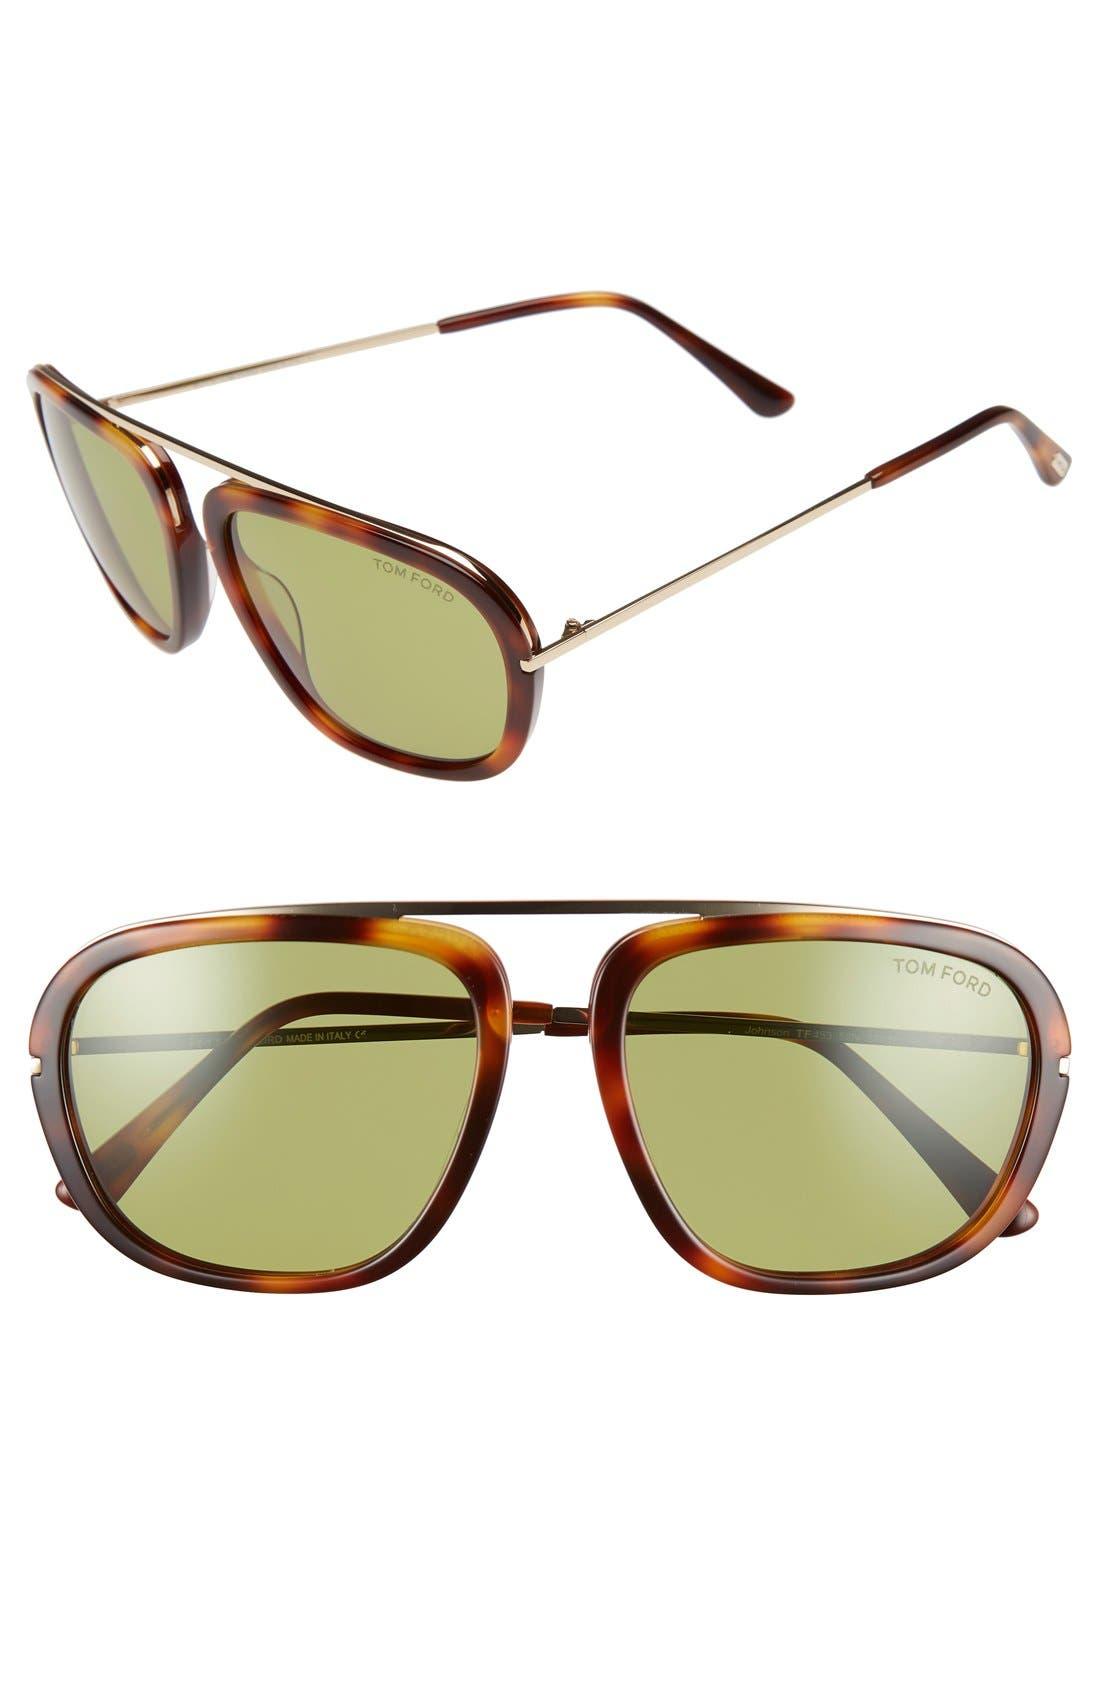 TOM FORD Johnson 57mm Sunglasses